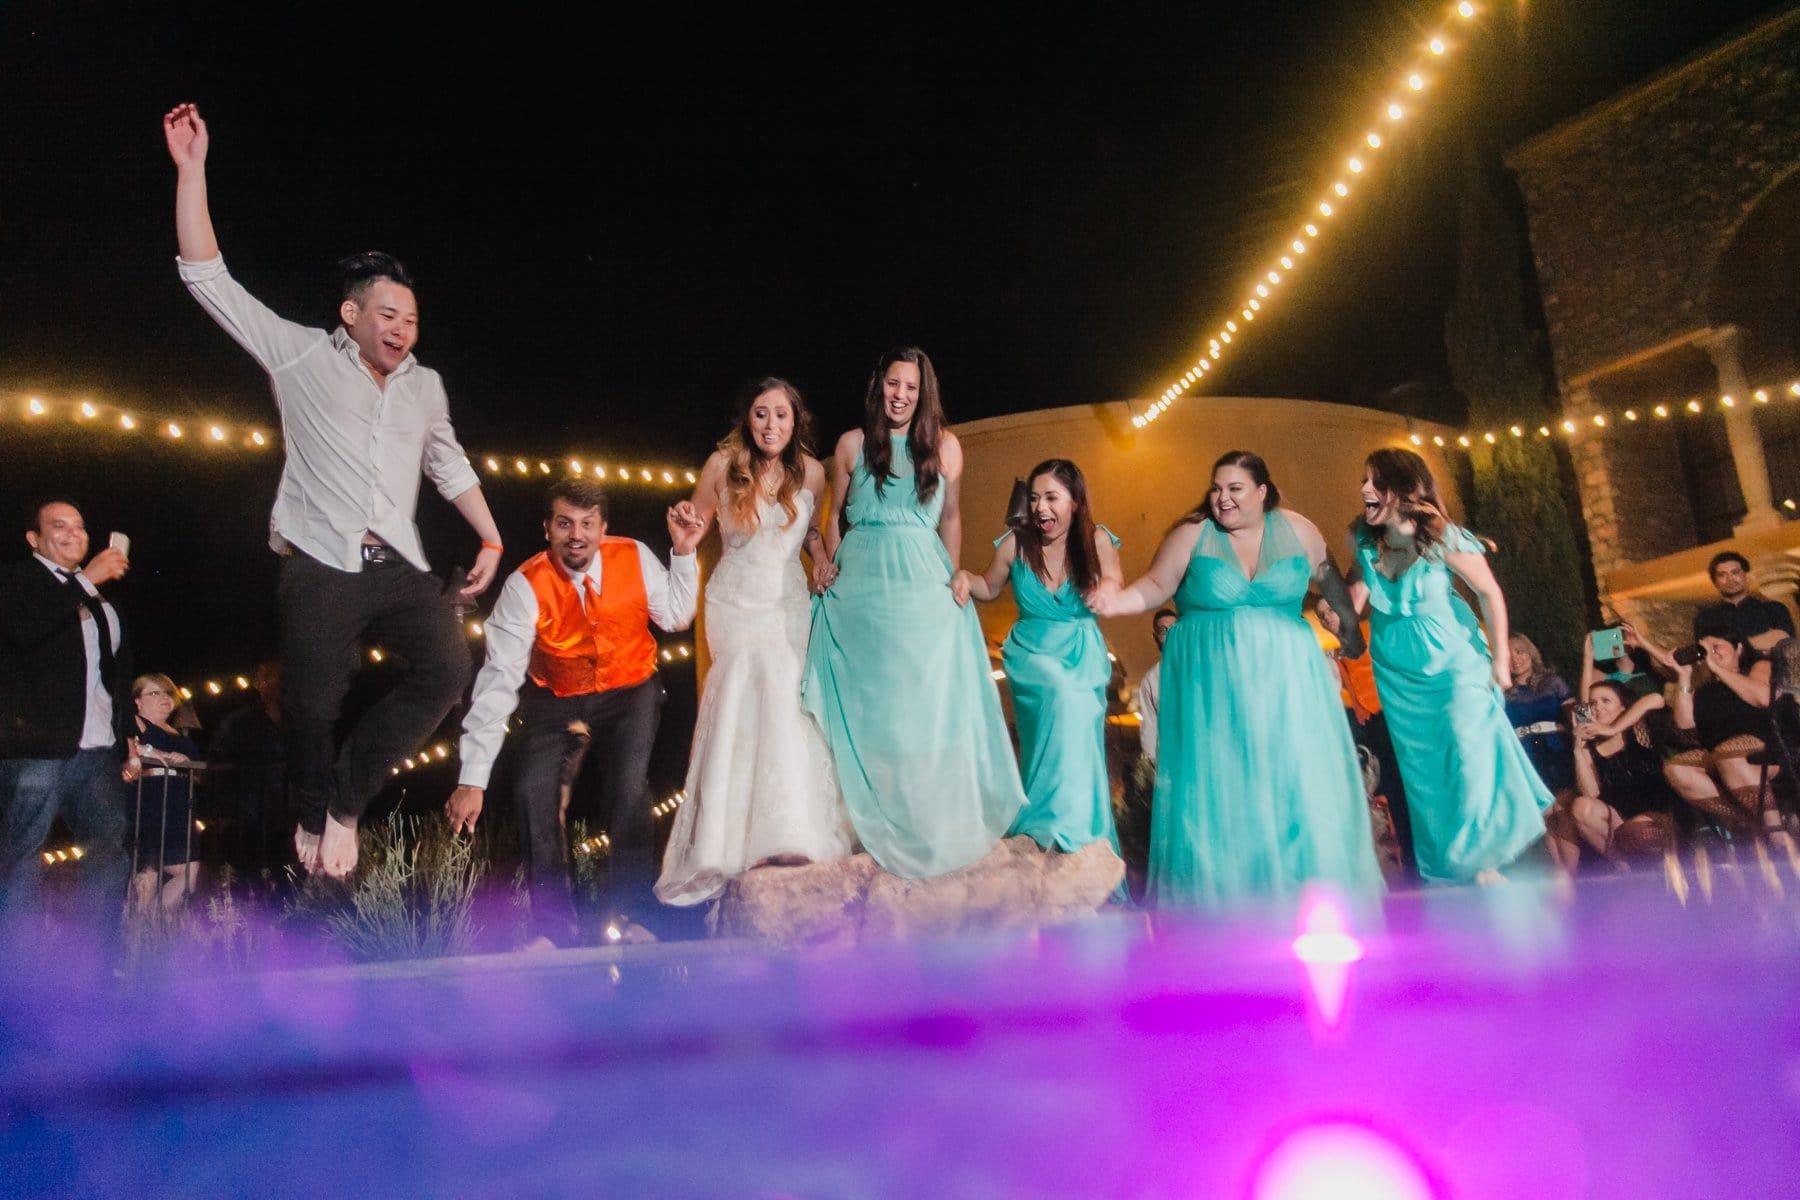 bride & groom & wedding party jumping into pool underwater photo